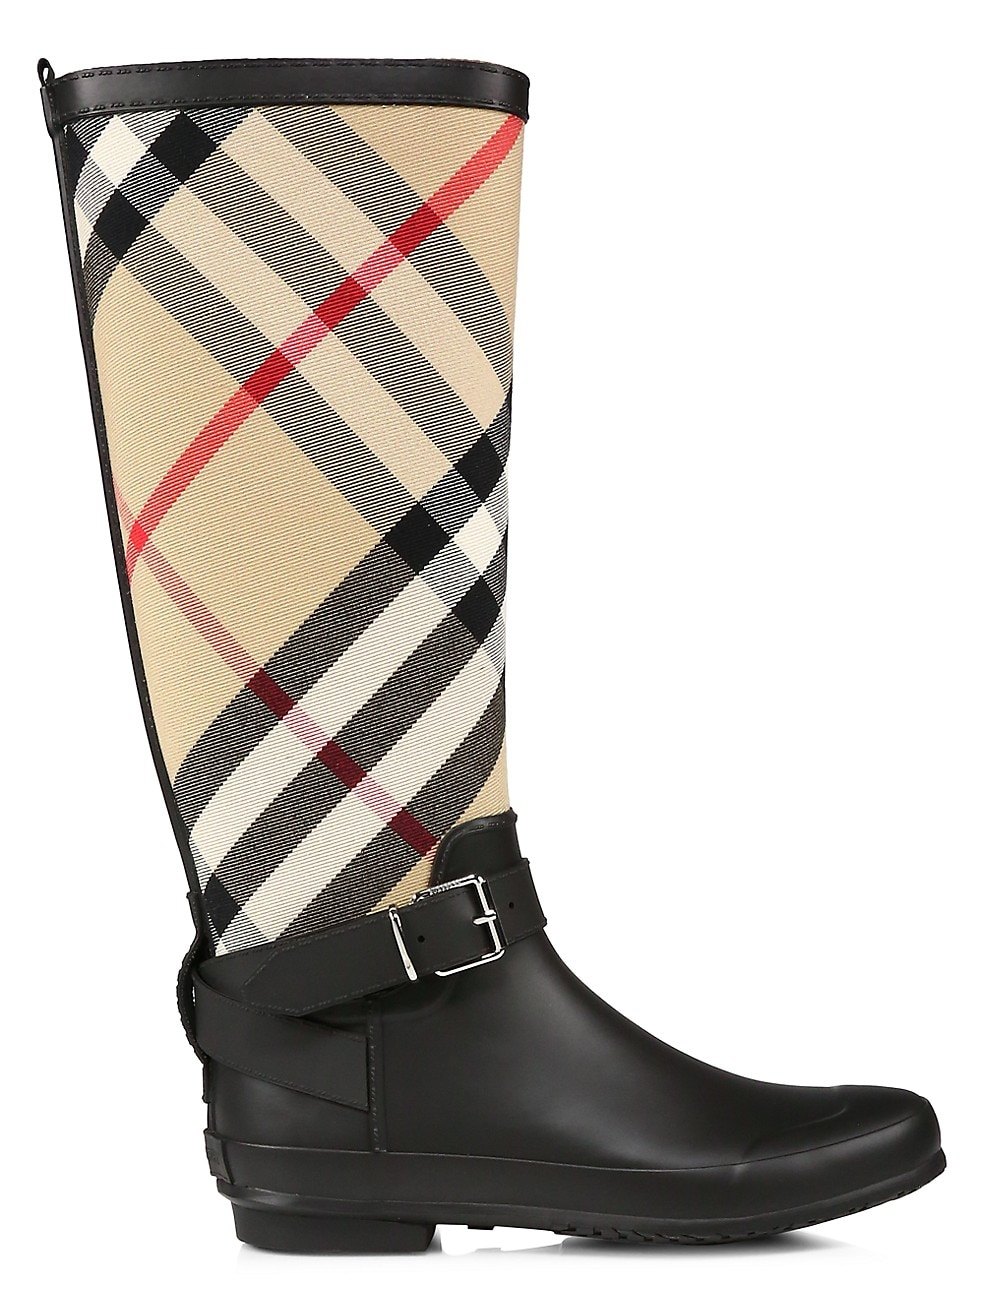 Burberry Simeon Knee-High Vintage Check Boots